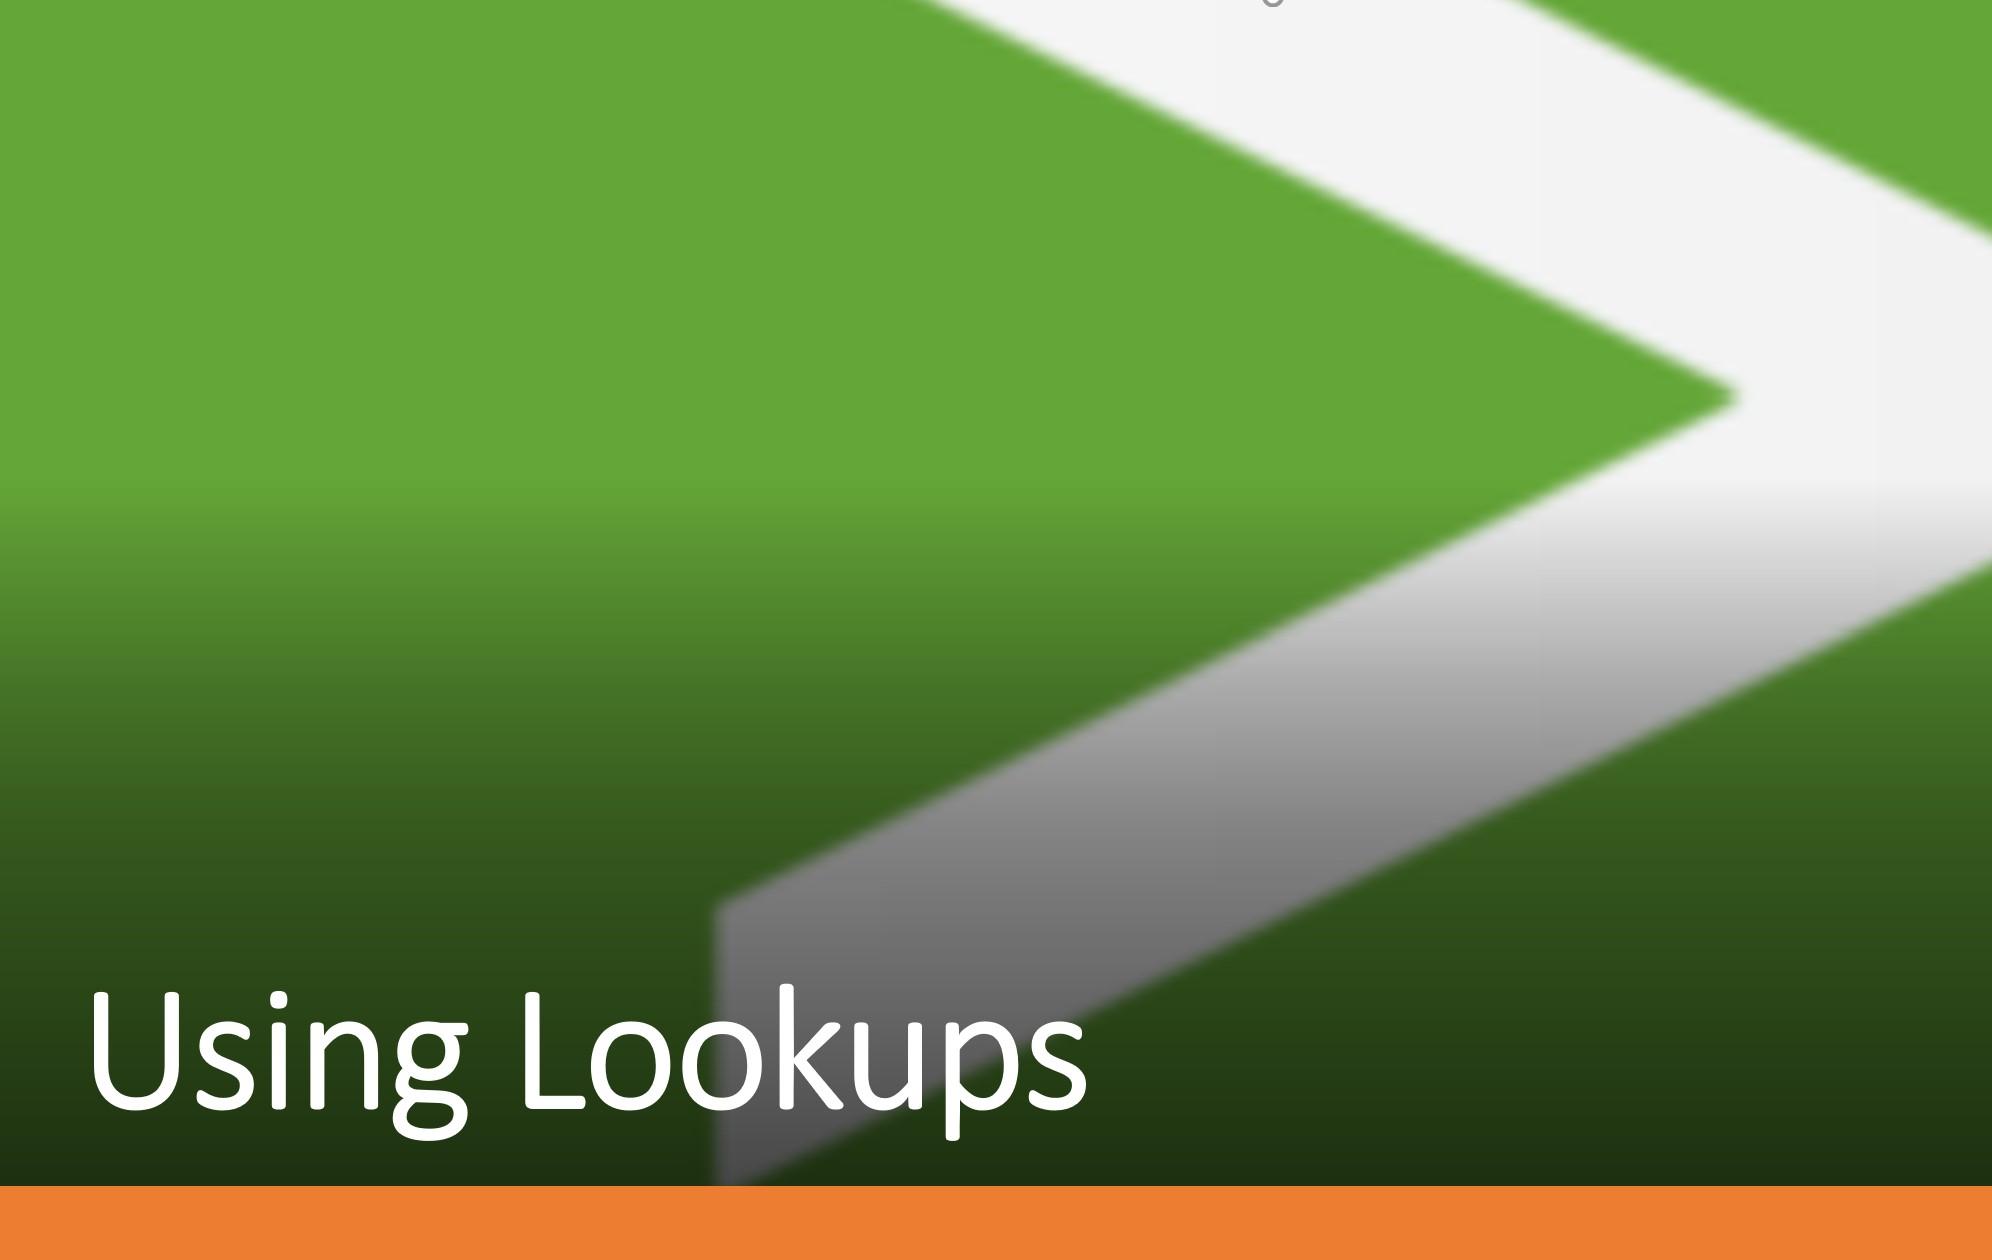 UsingLookups_splunk_bitsIO